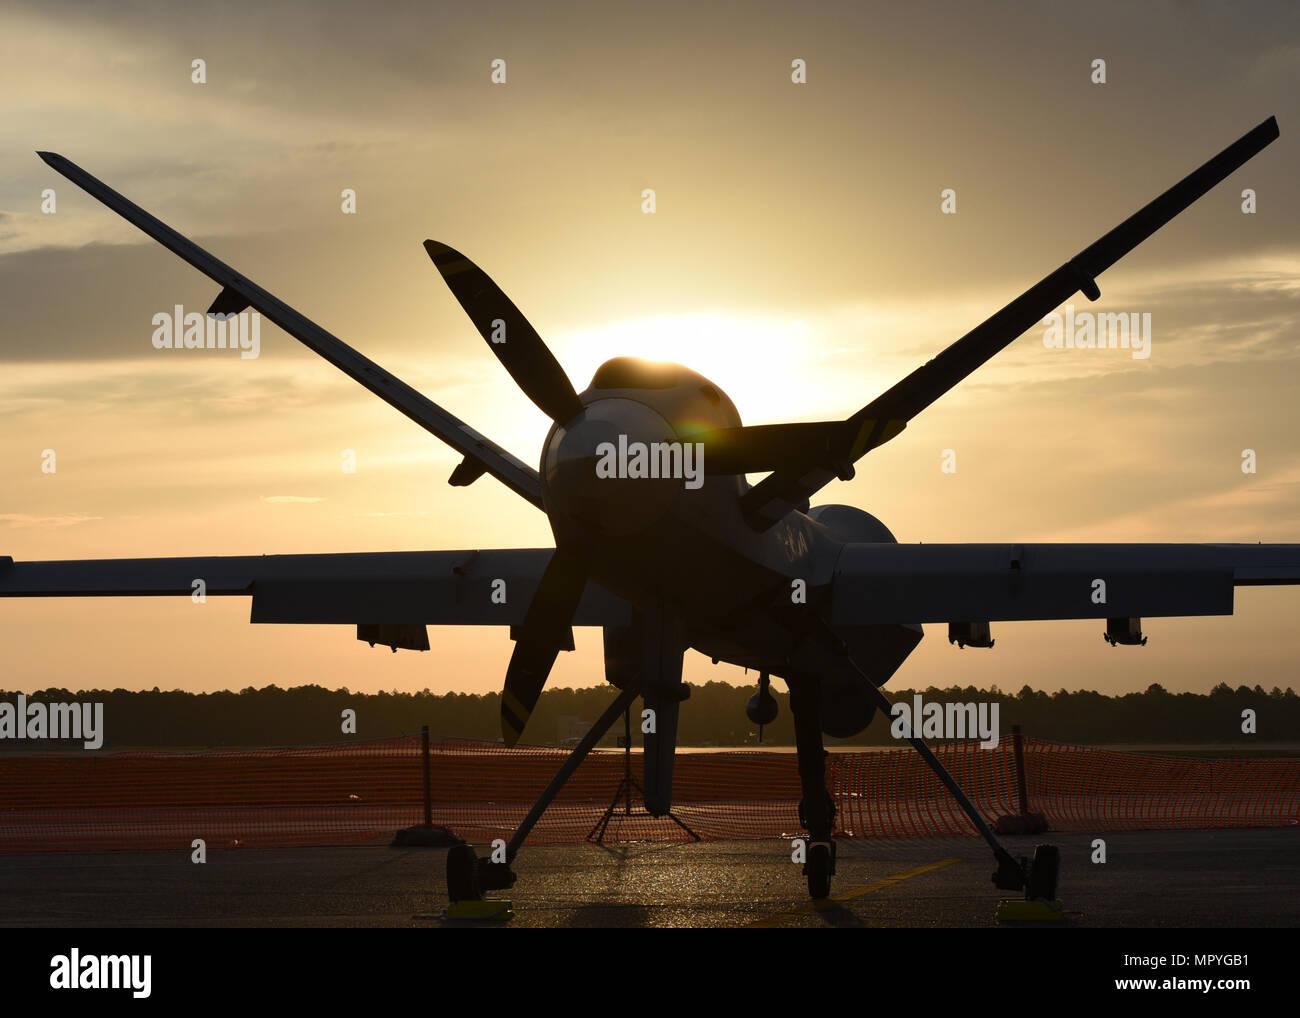 U S Air Force Mq 9 Reaper Stock Photos & U S Air Force Mq 9